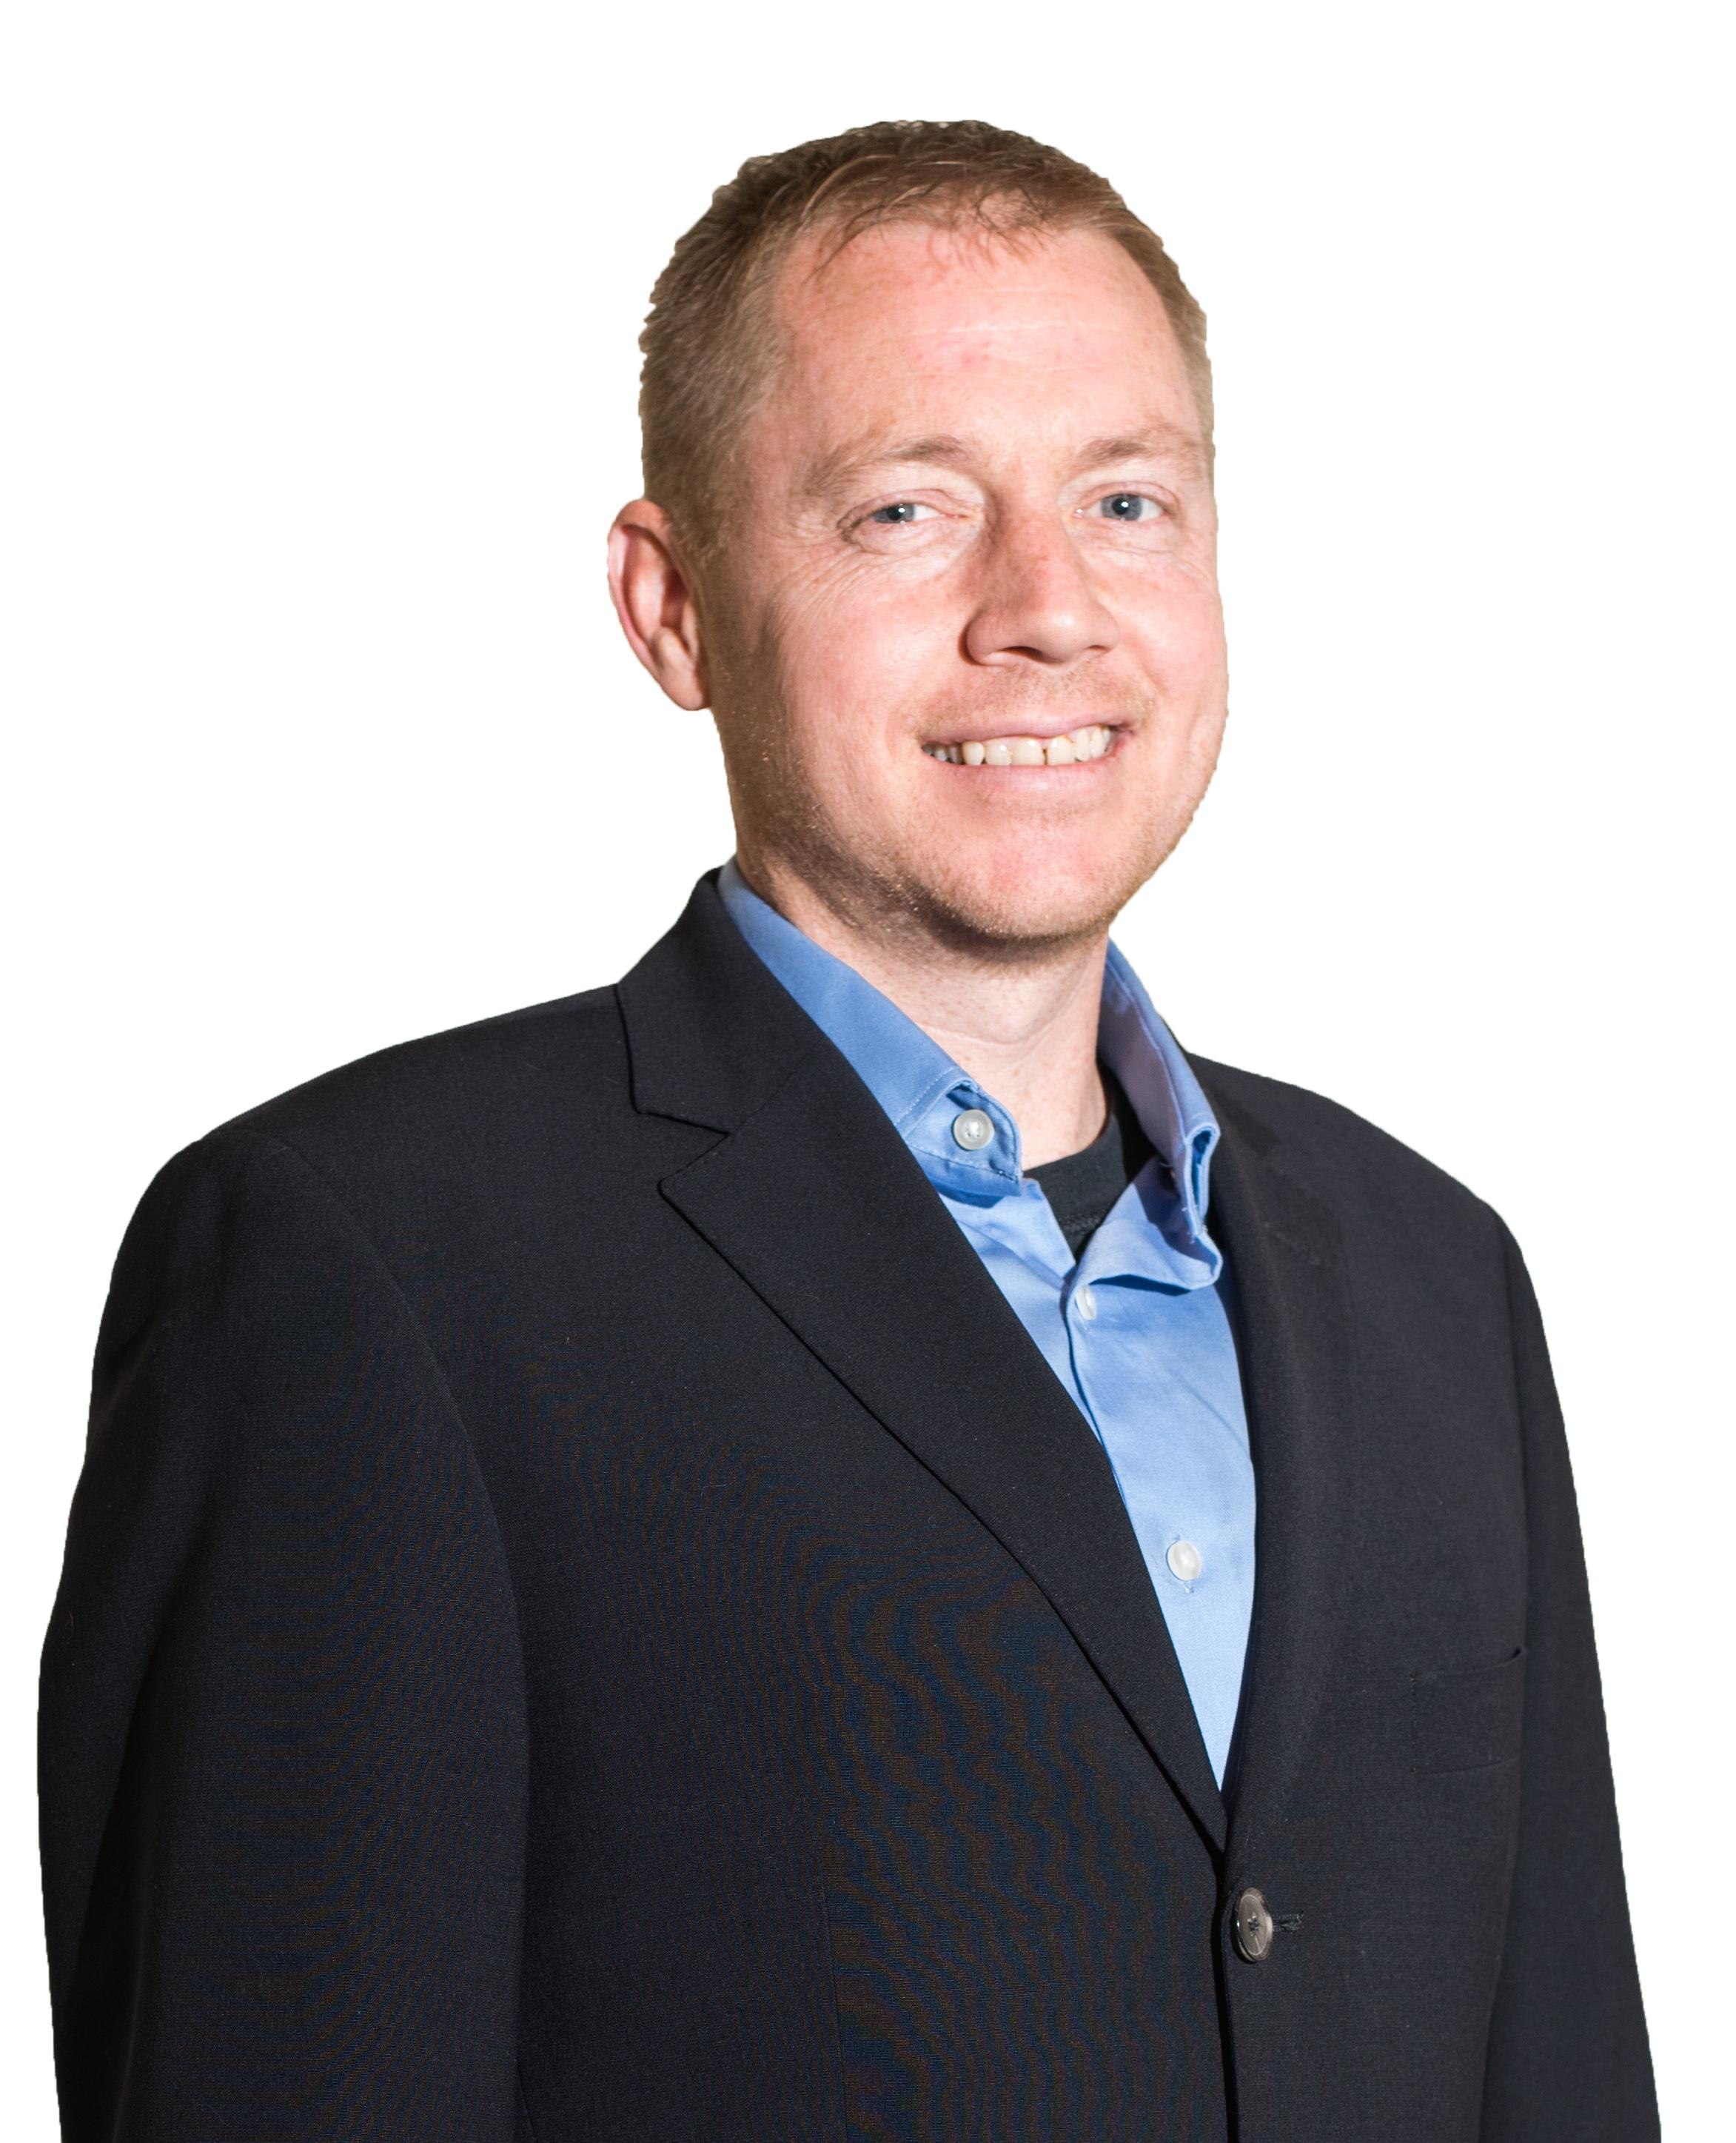 Chris Weathers